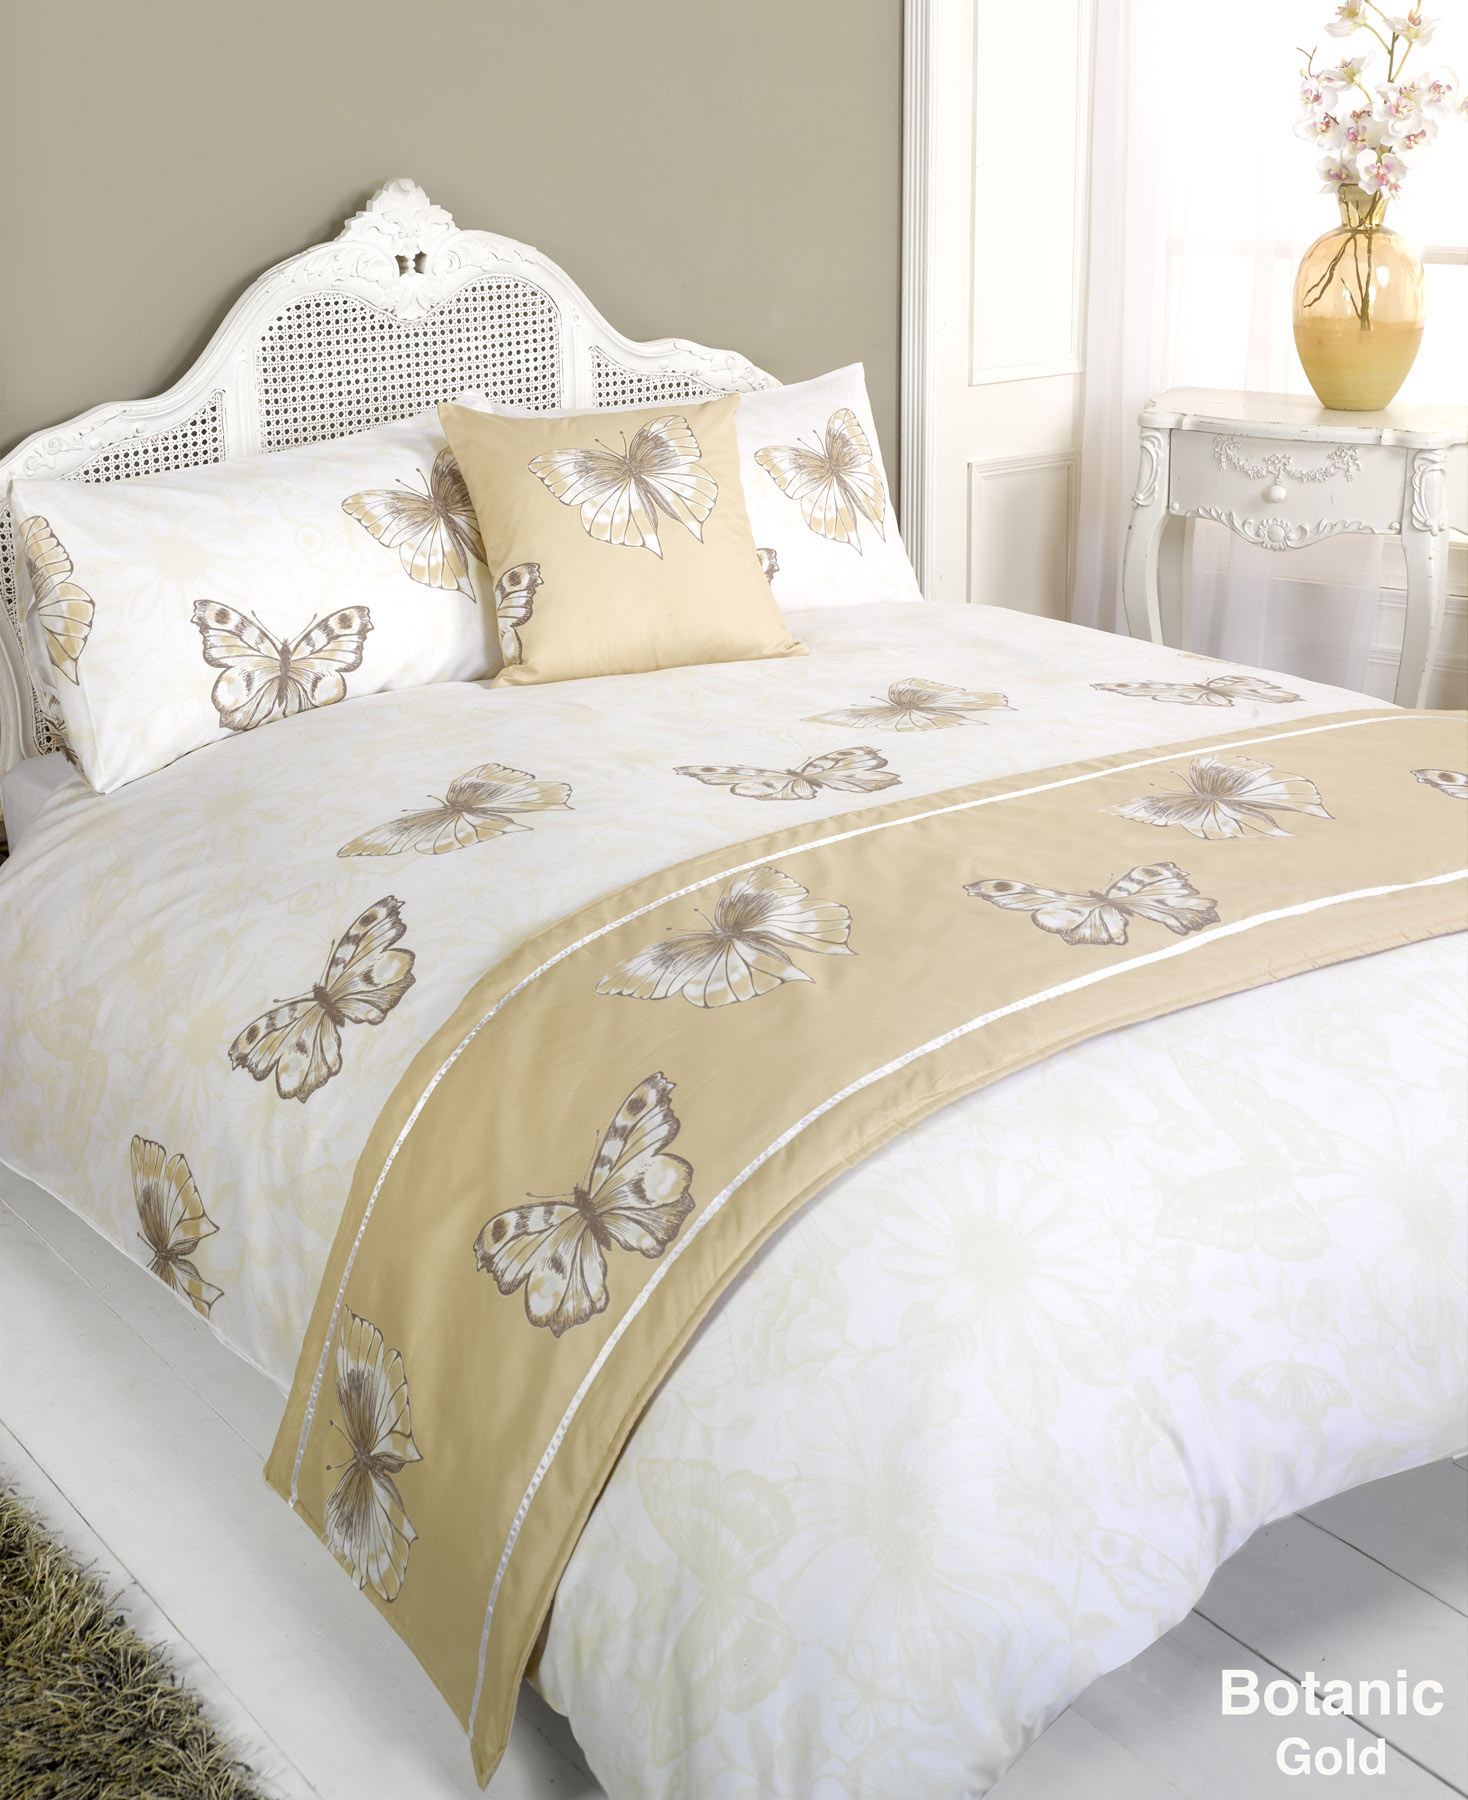 stepp bettdecke bettw sche bed in a bag gold einzelbett doppelbett kingsize ebay. Black Bedroom Furniture Sets. Home Design Ideas